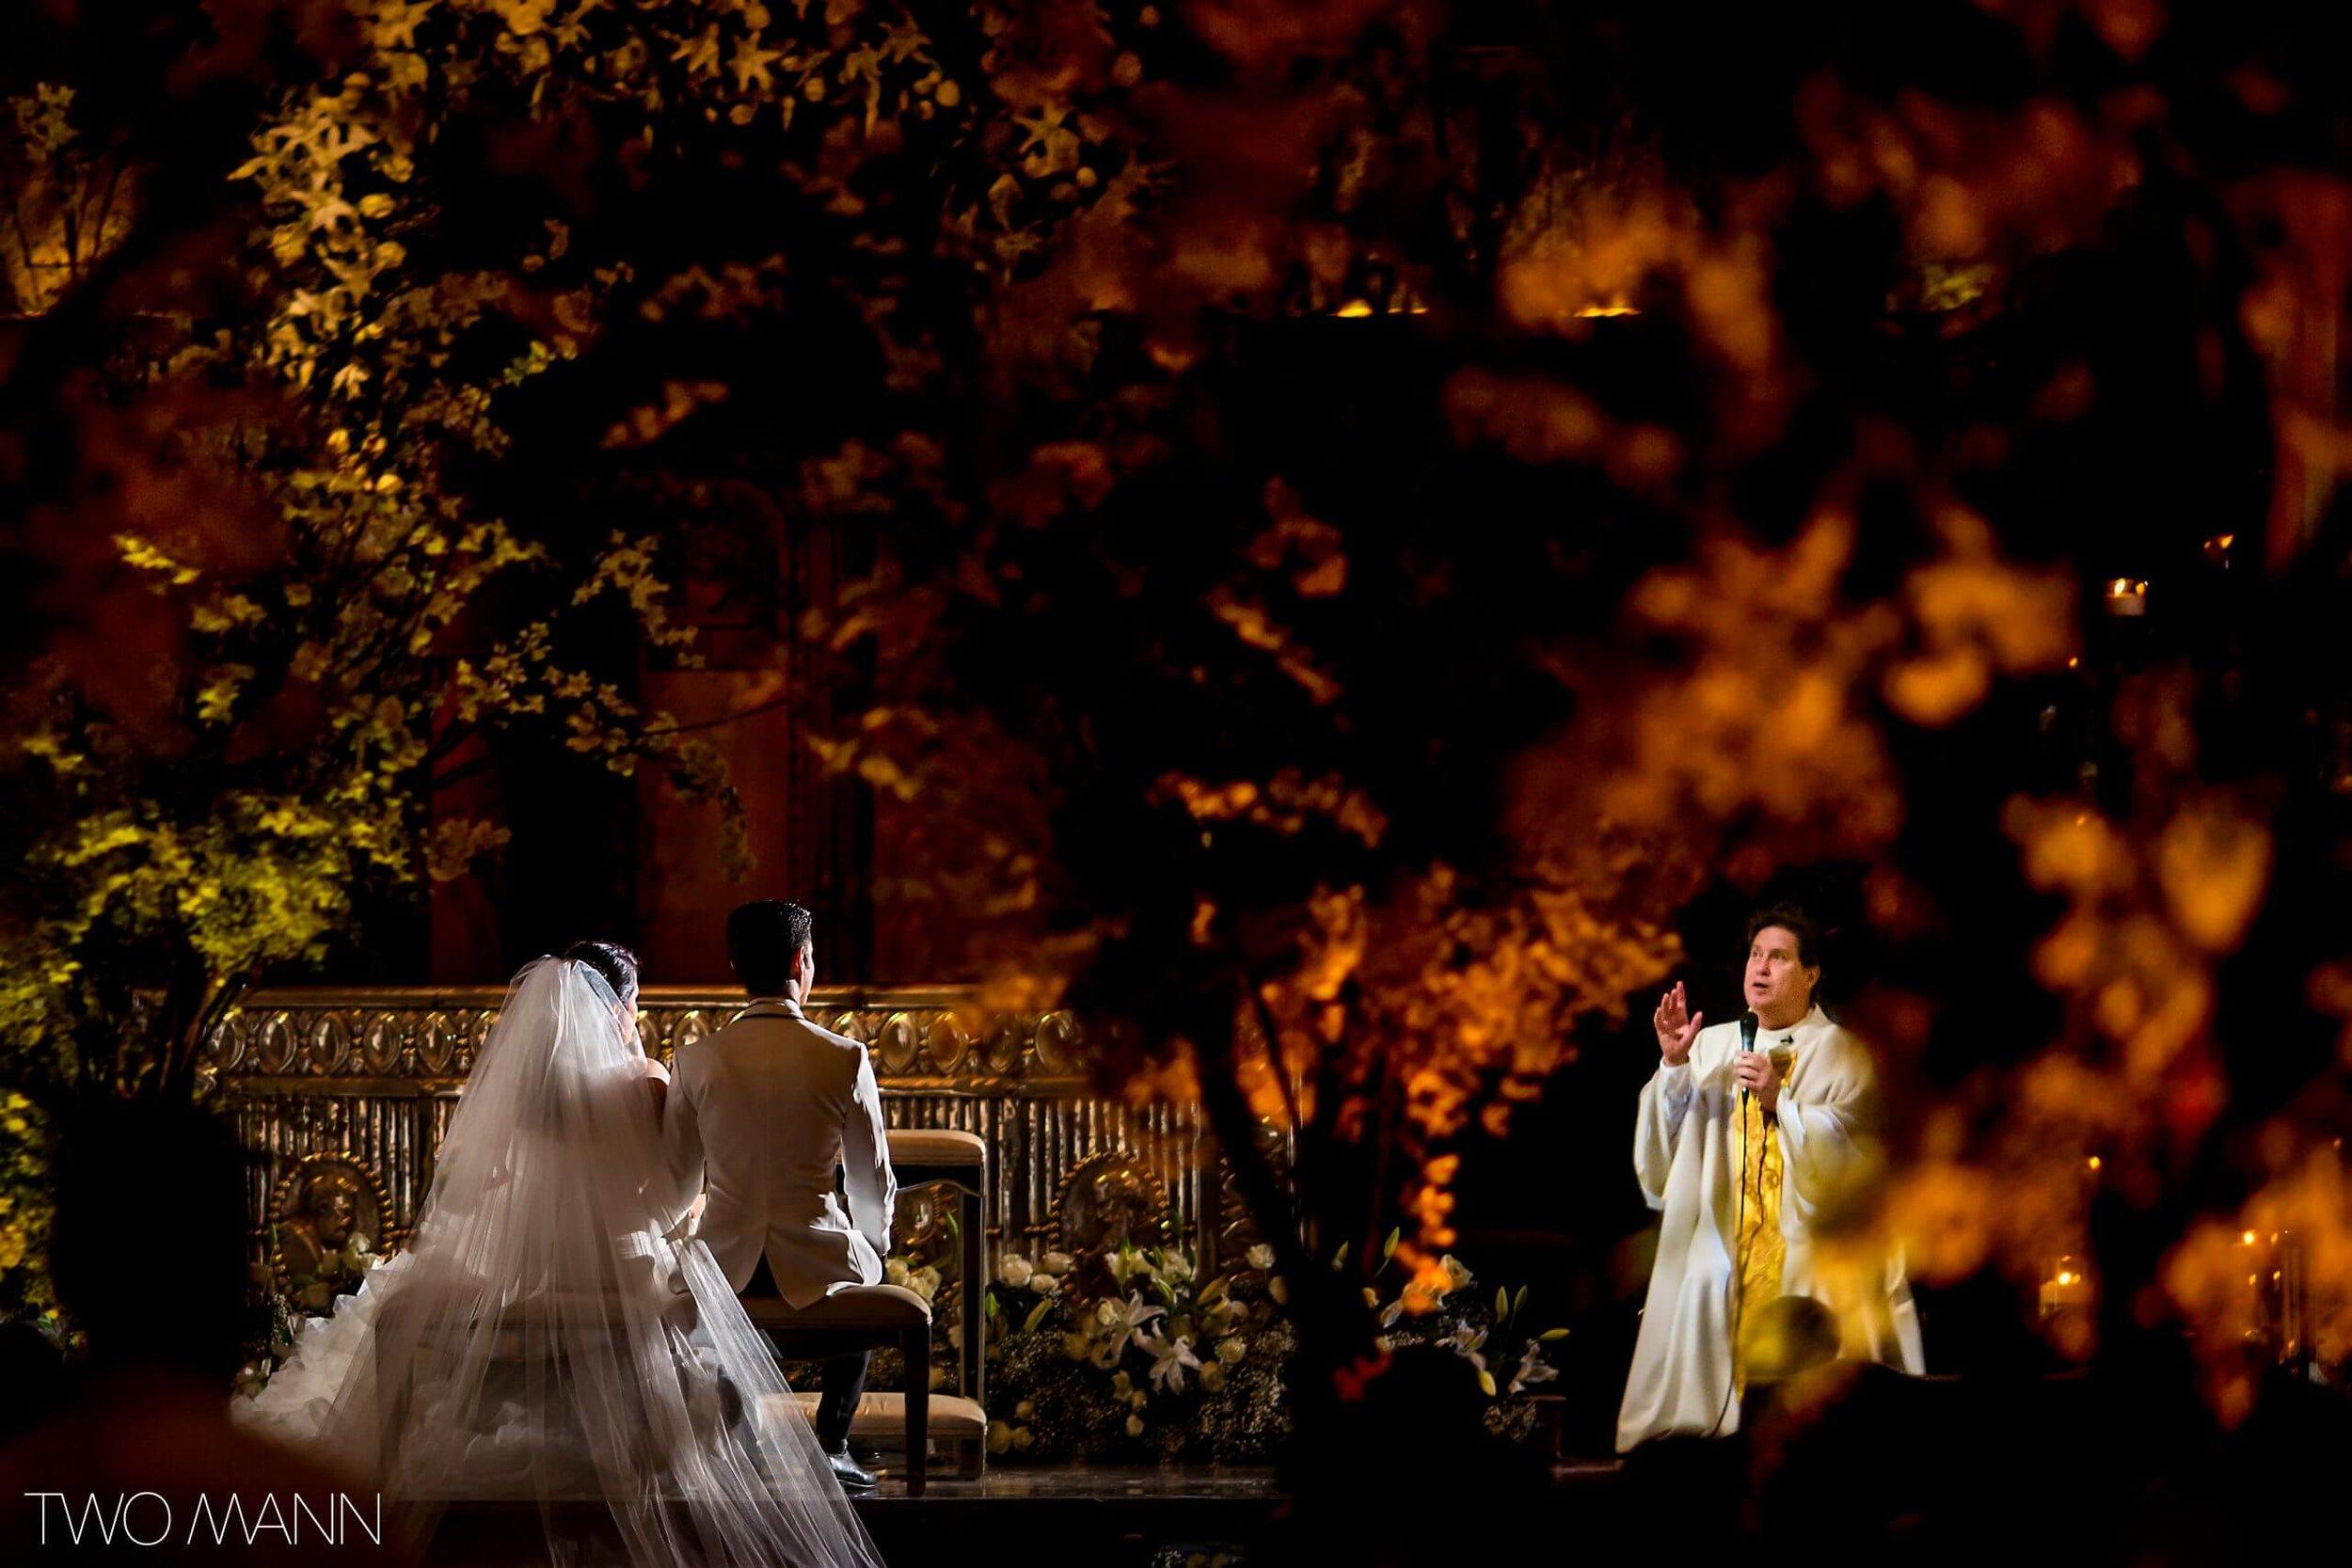 Mexico-Wedding-Photography-Two-Mann-Monica-Mike-Monterrey-16-2560x1707.jpg